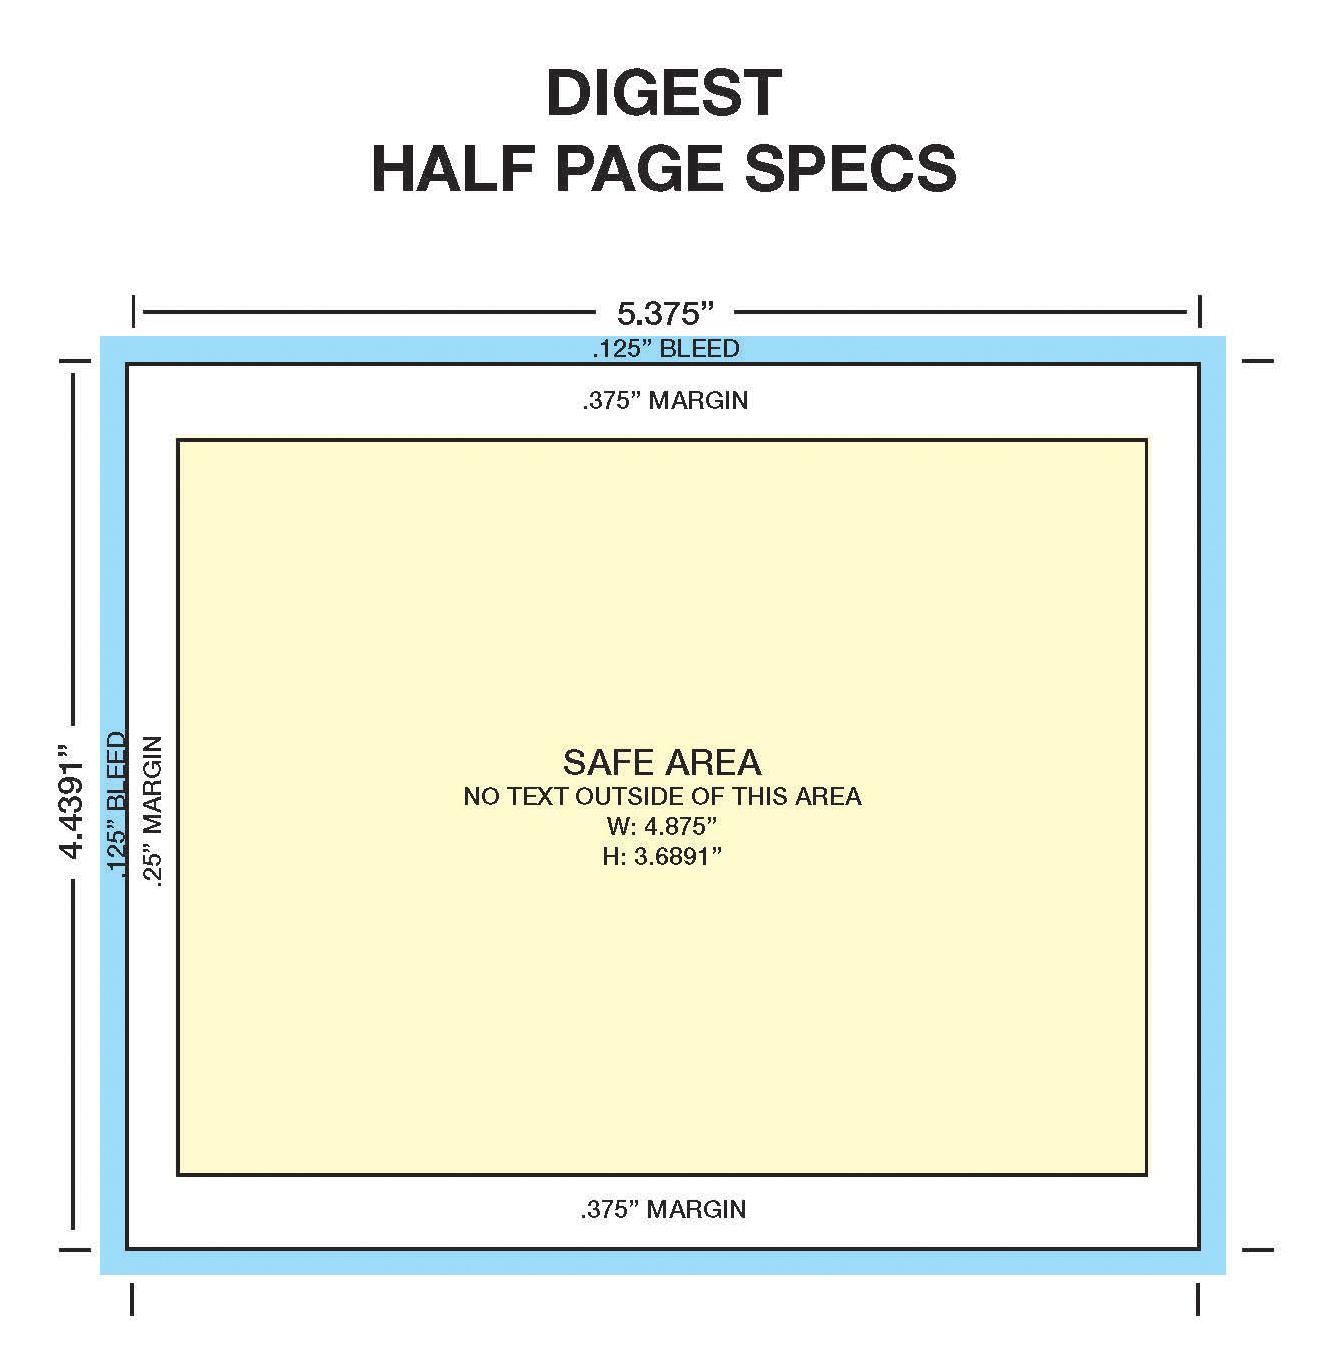 Digest Half Page Specs